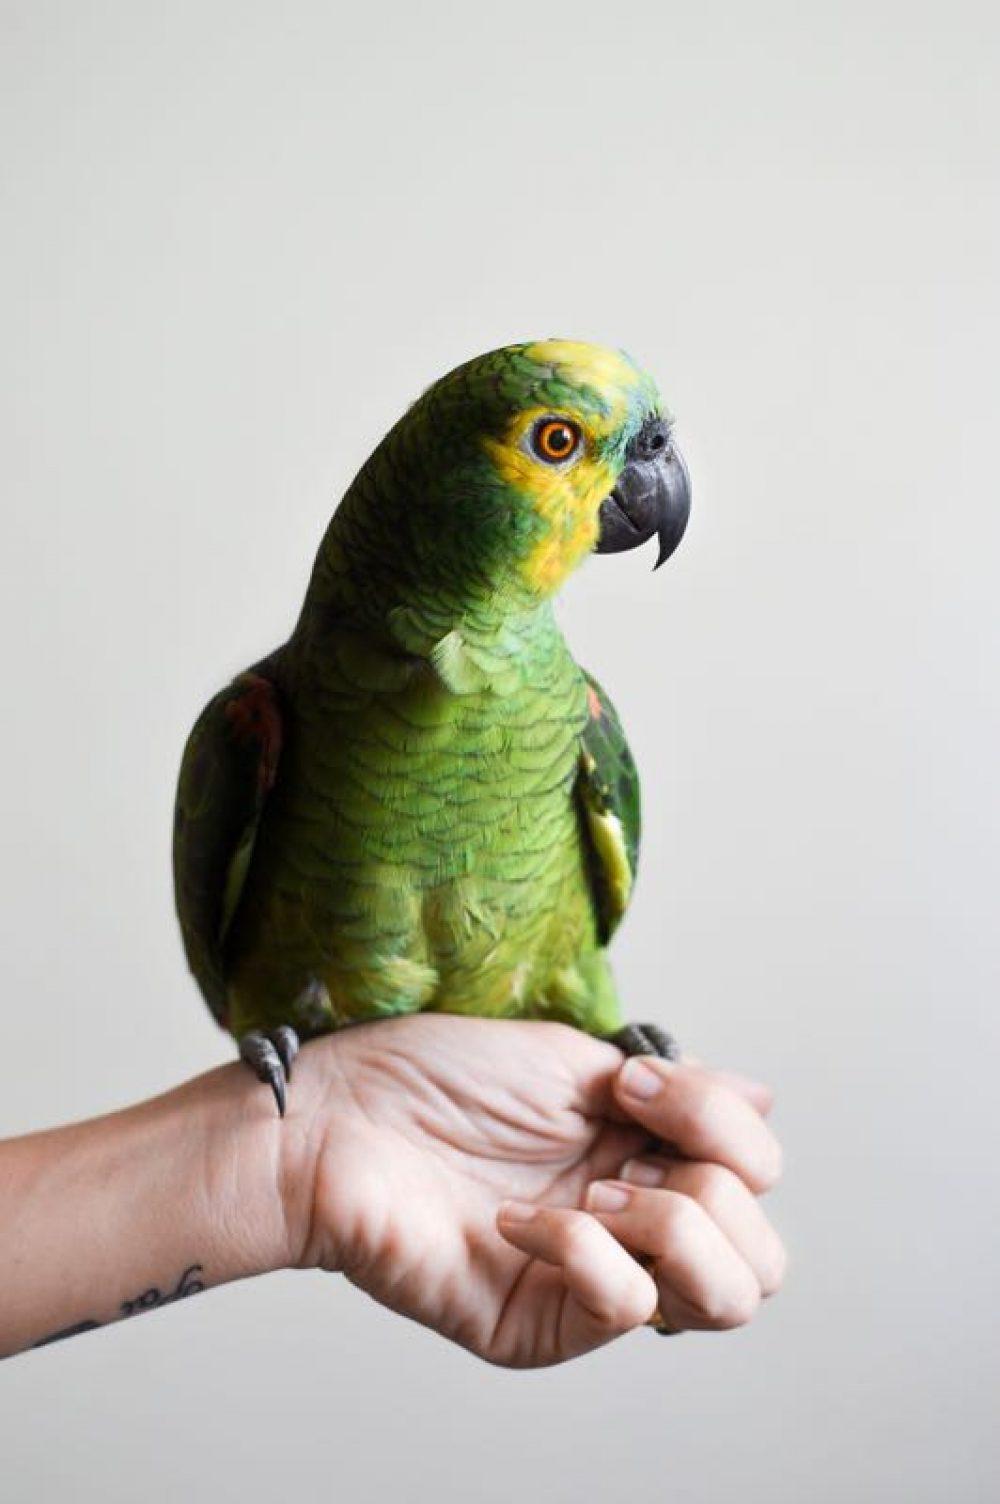 animaux-bird-1284082_1920